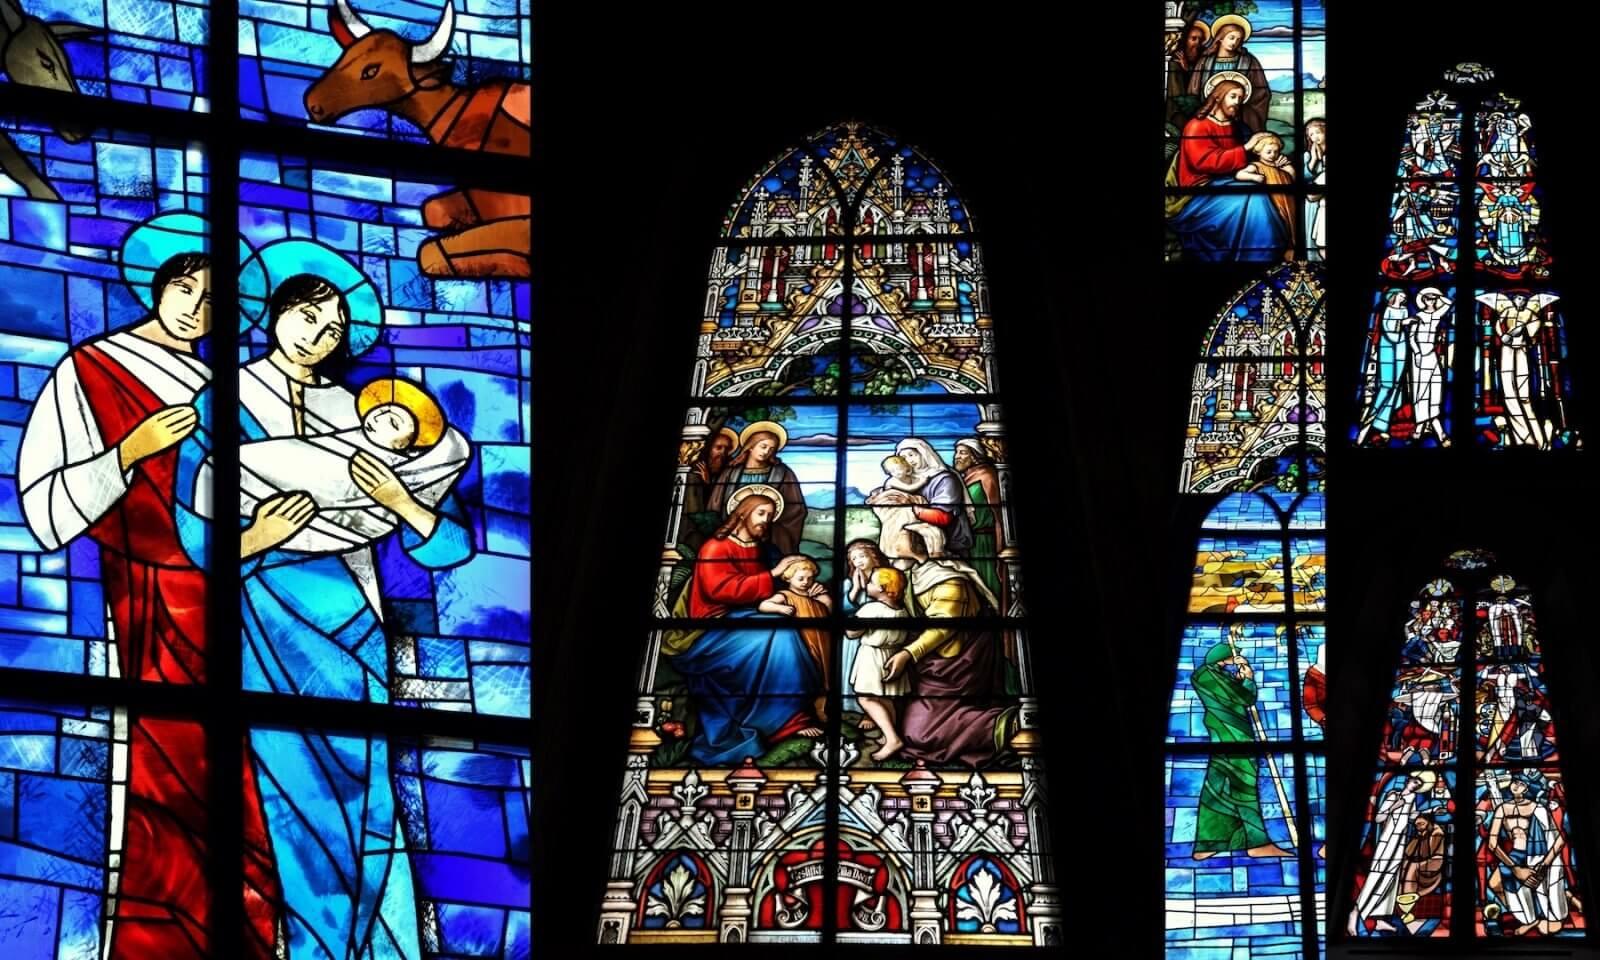 maria magdalena y jesus se besan